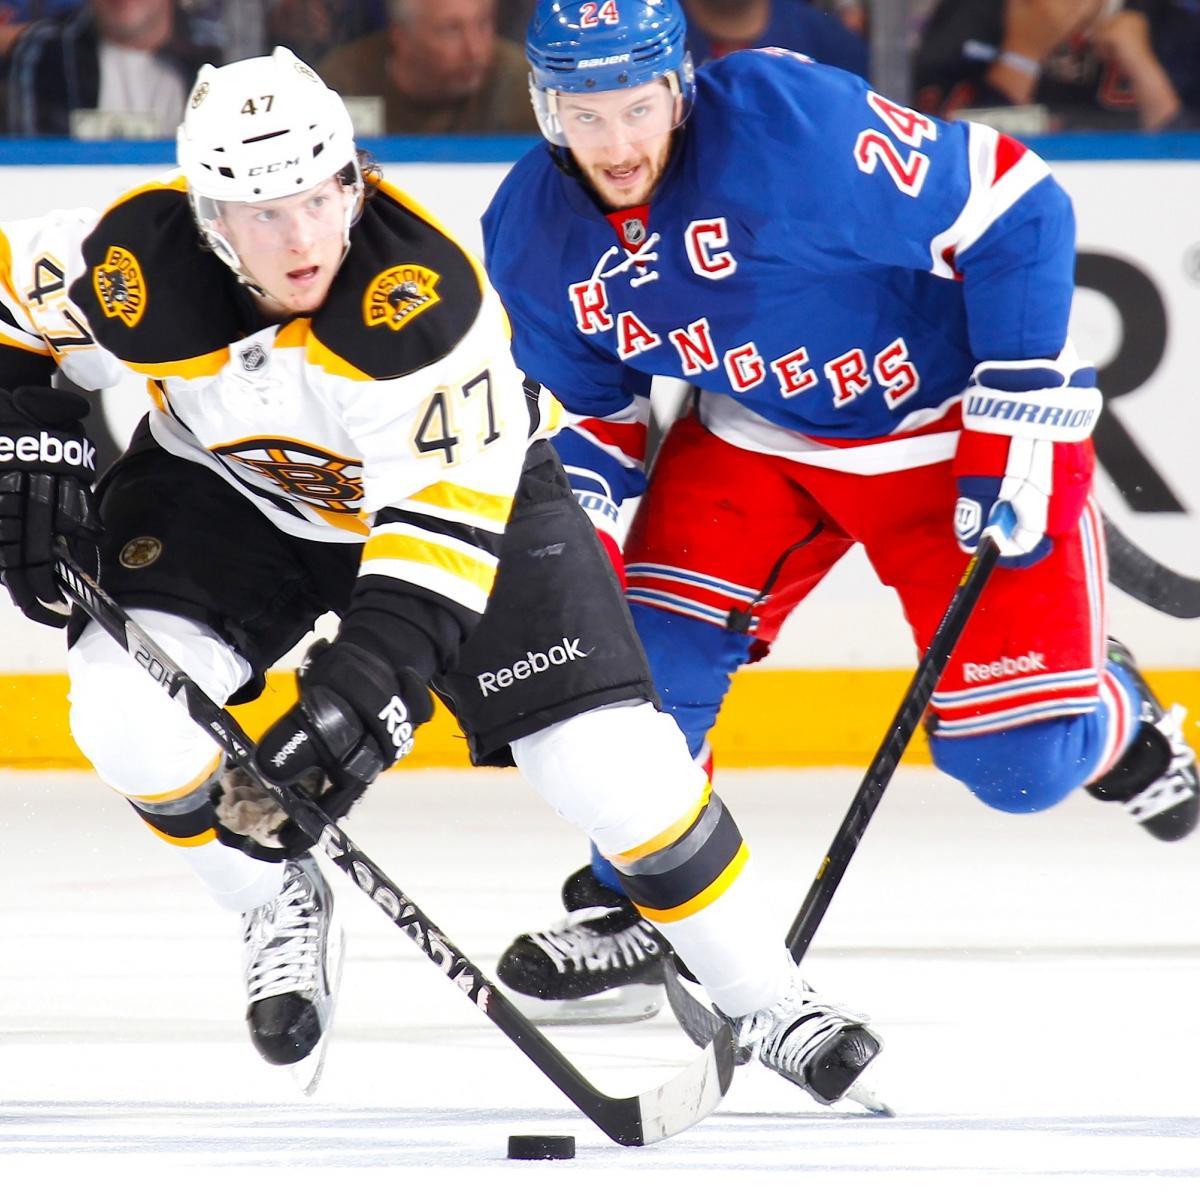 Bruins Vs. Rangers Game 3: Score, Twitter Reaction And